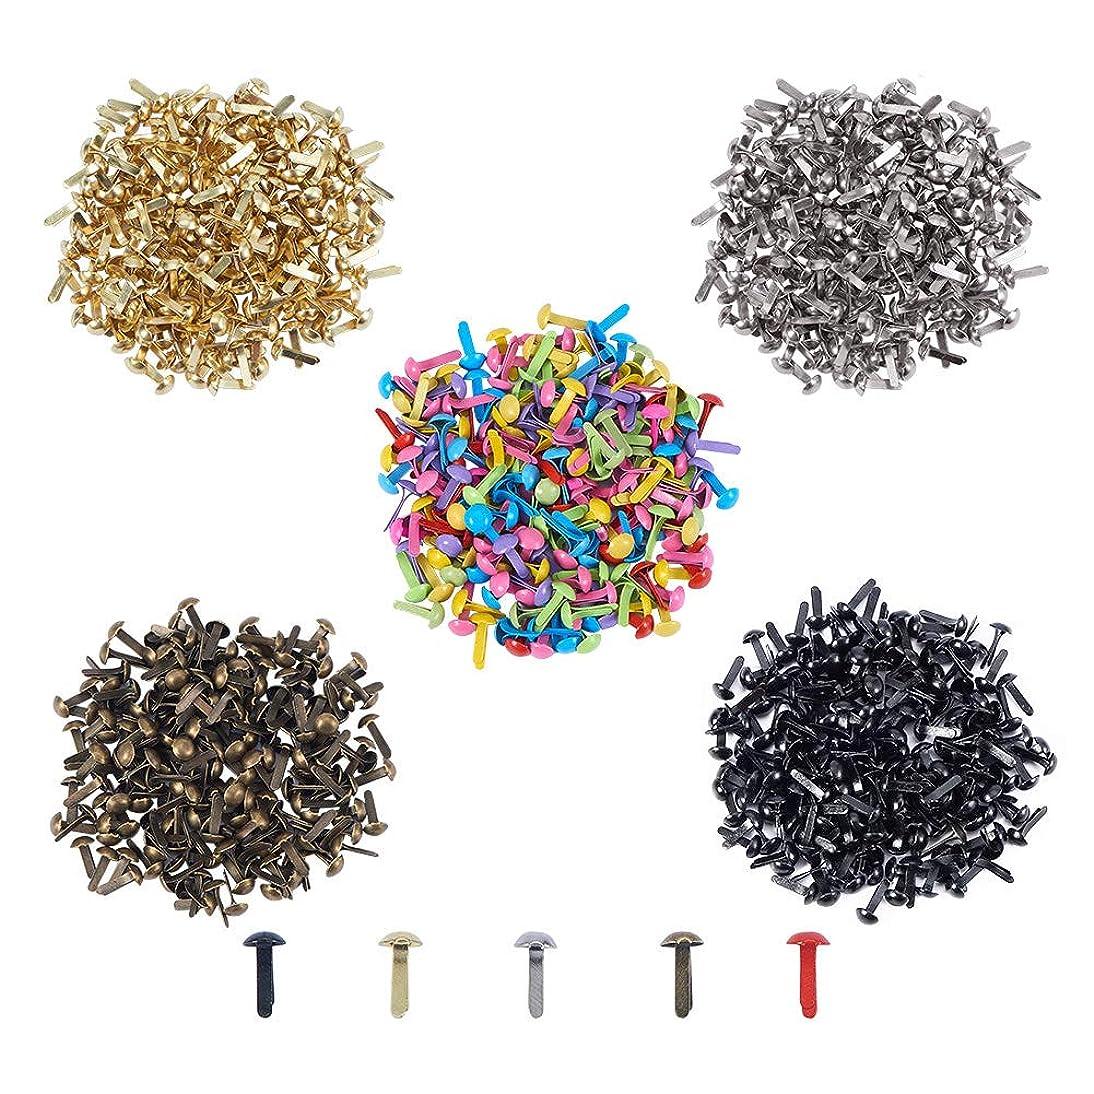 PH PandaHall 1000pcs 5 Colors Mini Brads Fasteners Metal Paper Fasteners Brass Plated Scrapbooking Brads for Crafts Making DIY